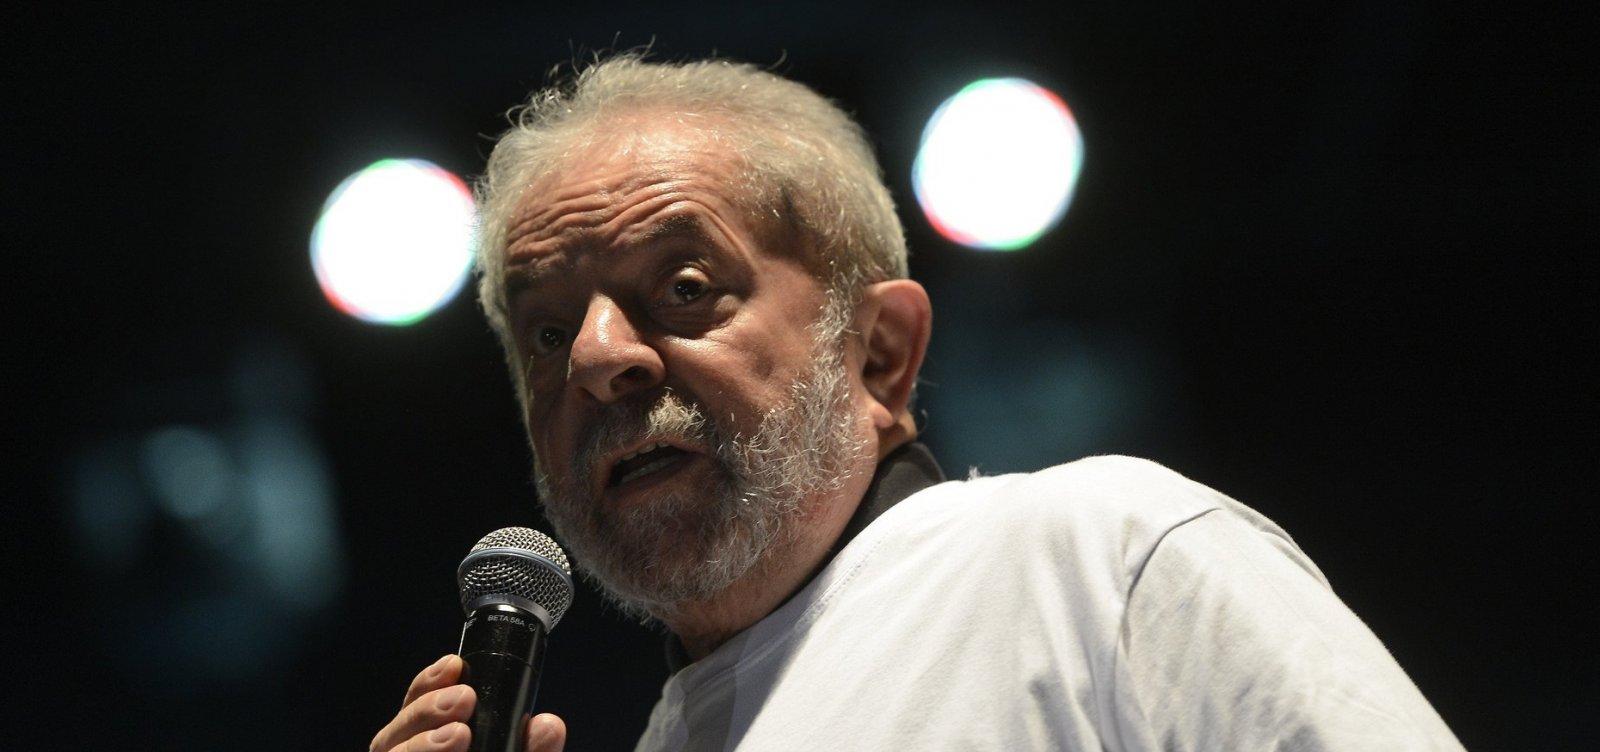 'É maluquice', diz Lula sobre apelos para Haddad renunciar e Ciro concorrer